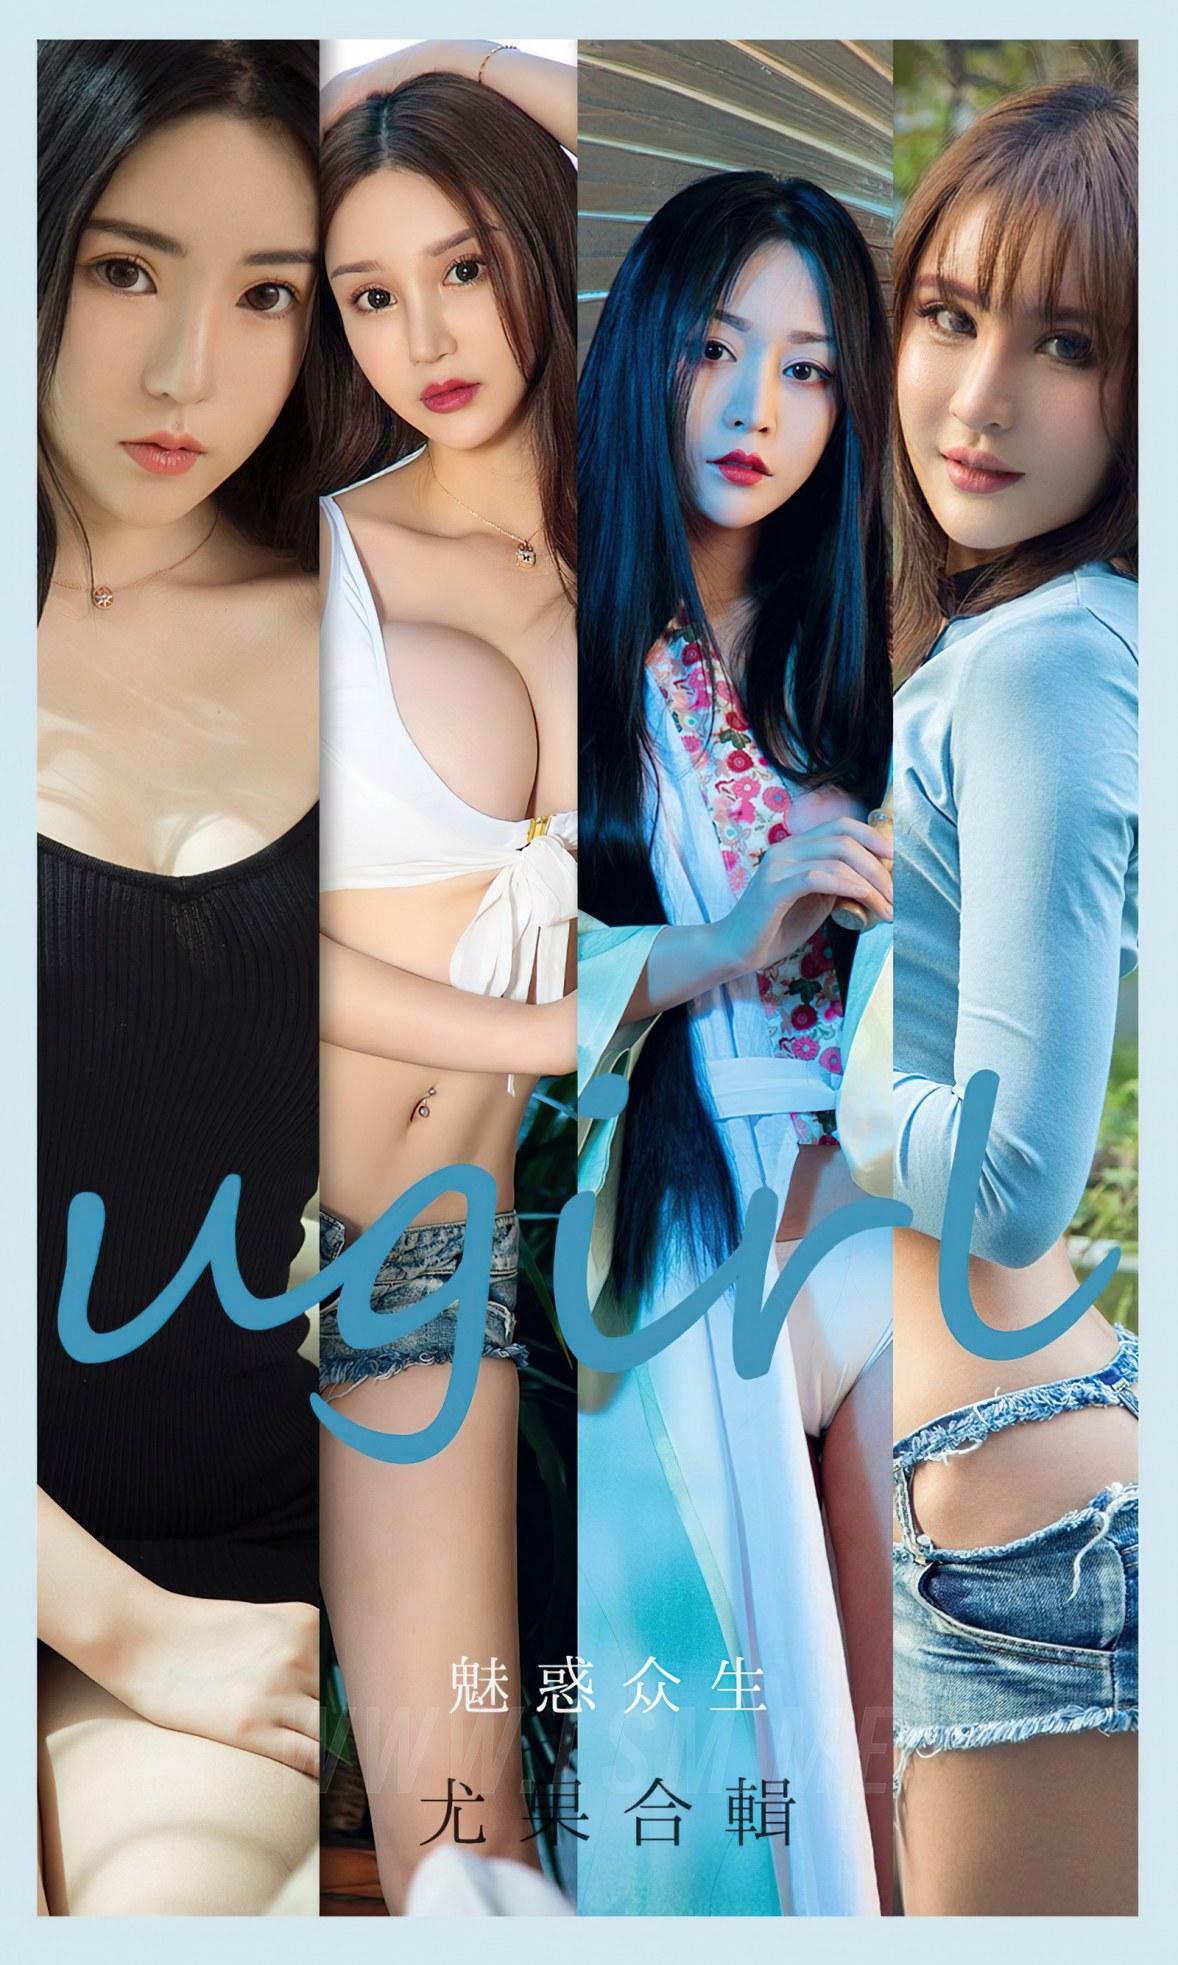 UGirls 爱尤物 No.2128 魅惑众生 模特合辑 - 1